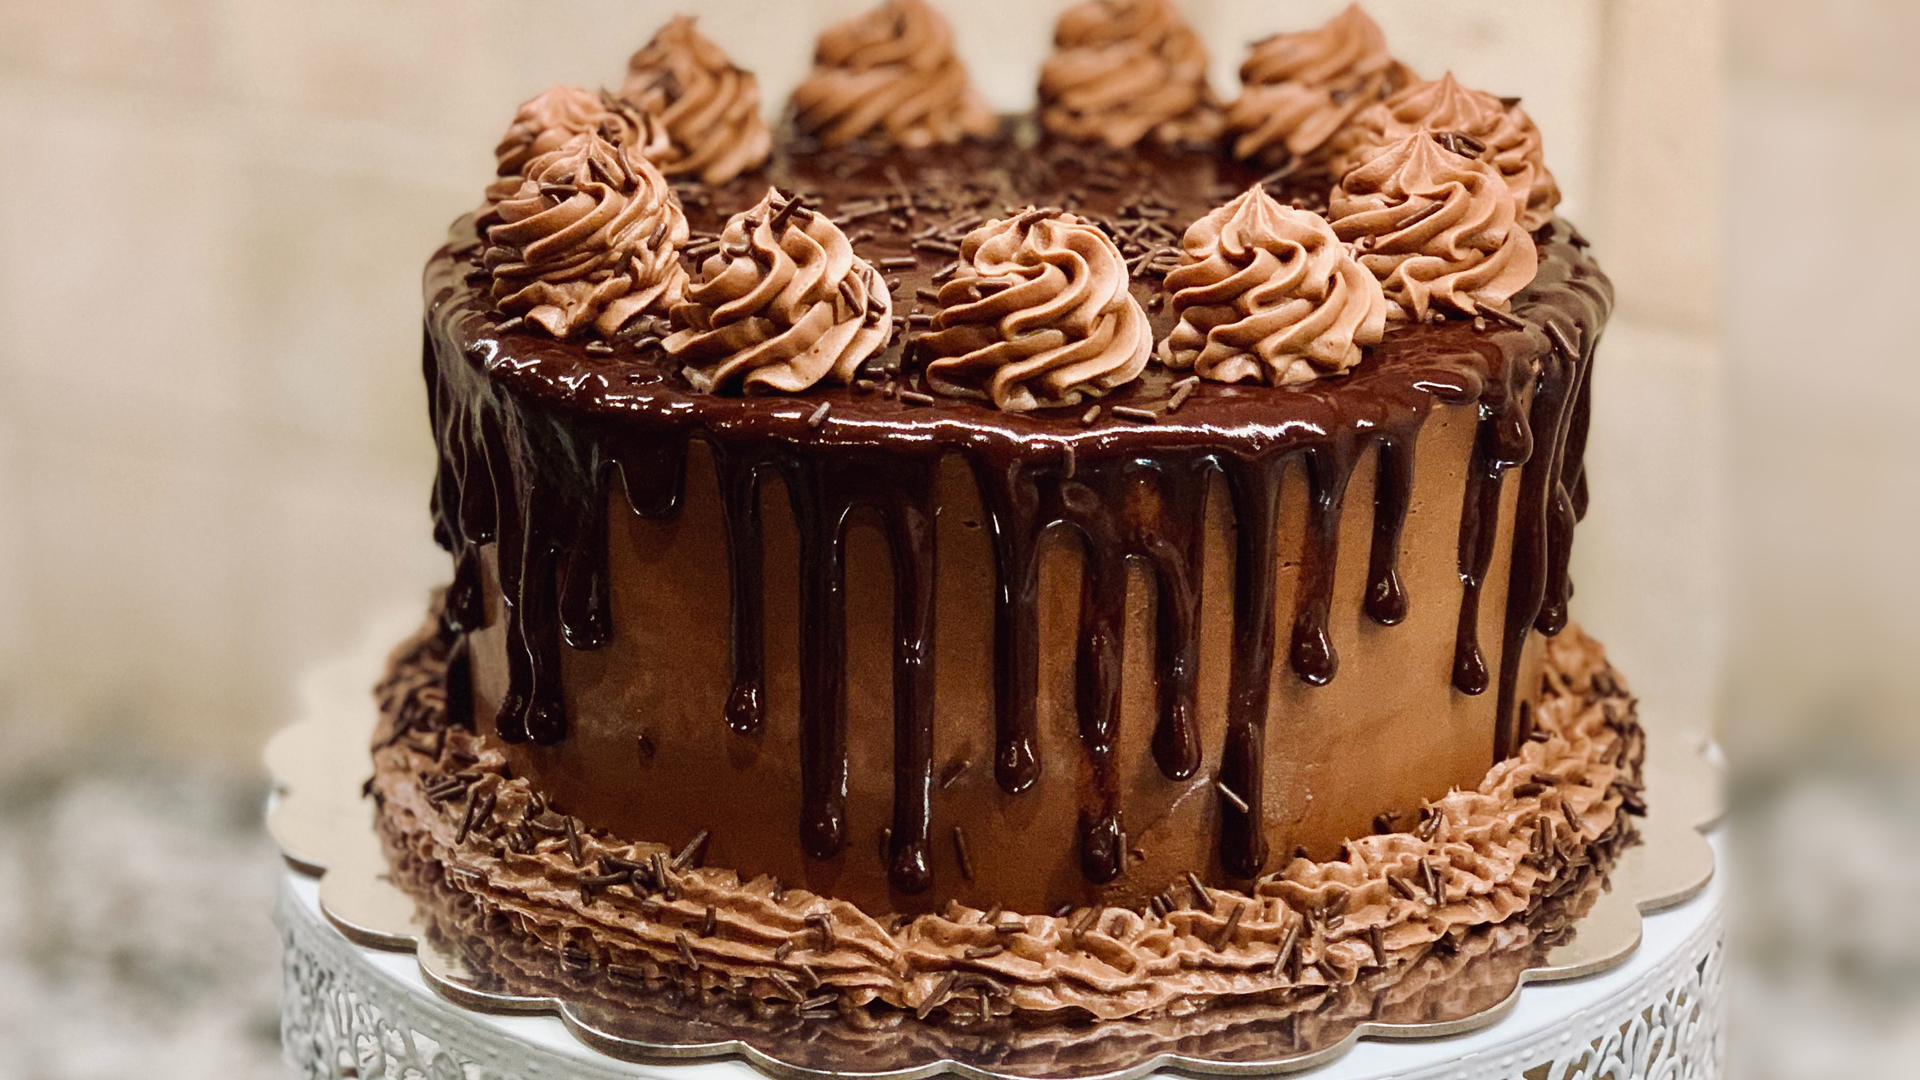 Kinky Cake Baker's Profession Ends Her Political Career